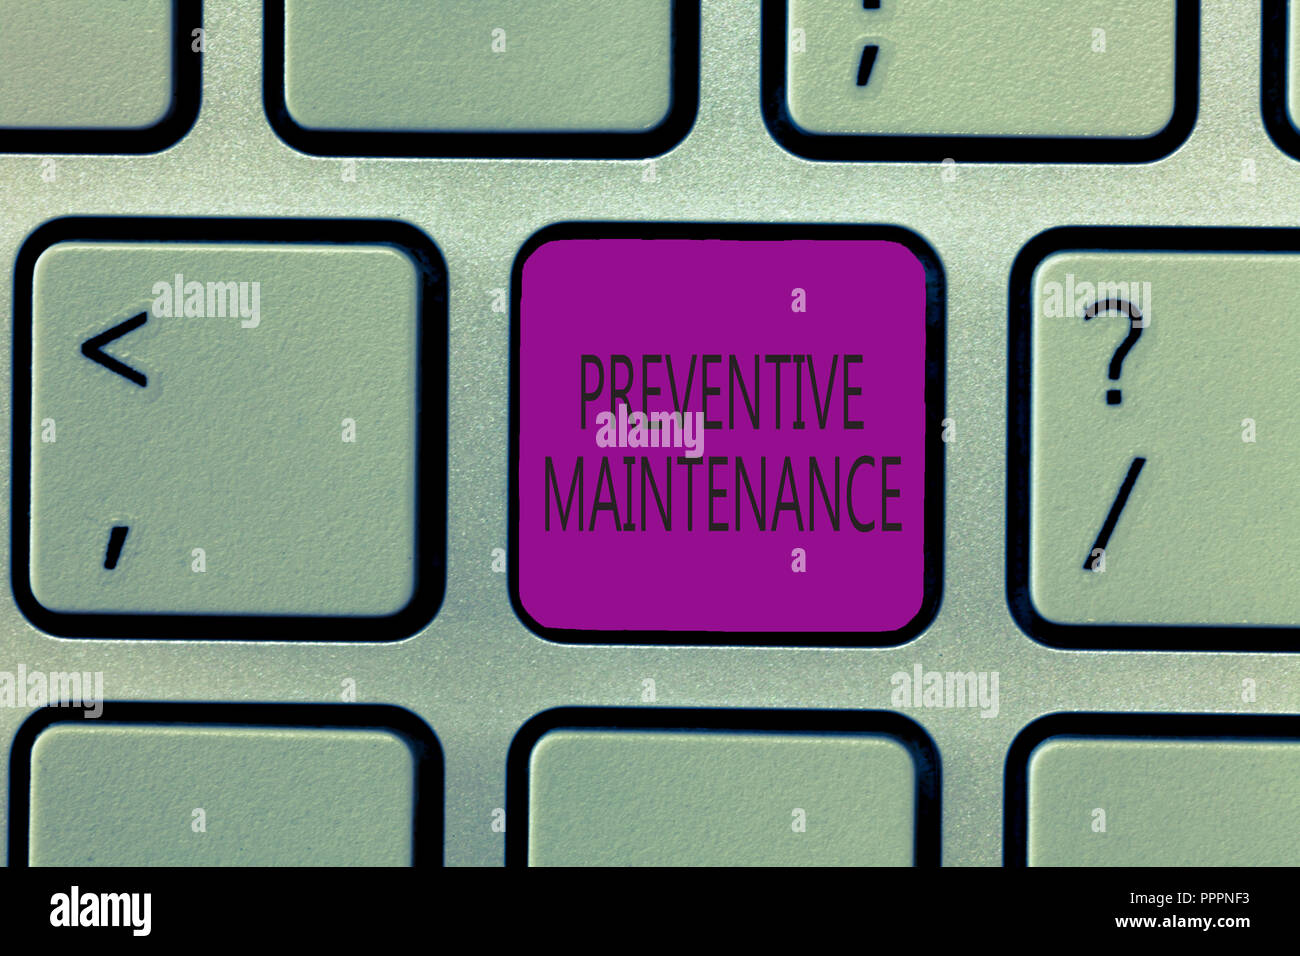 Preventive Maintenance Stock Photos & Preventive Maintenance